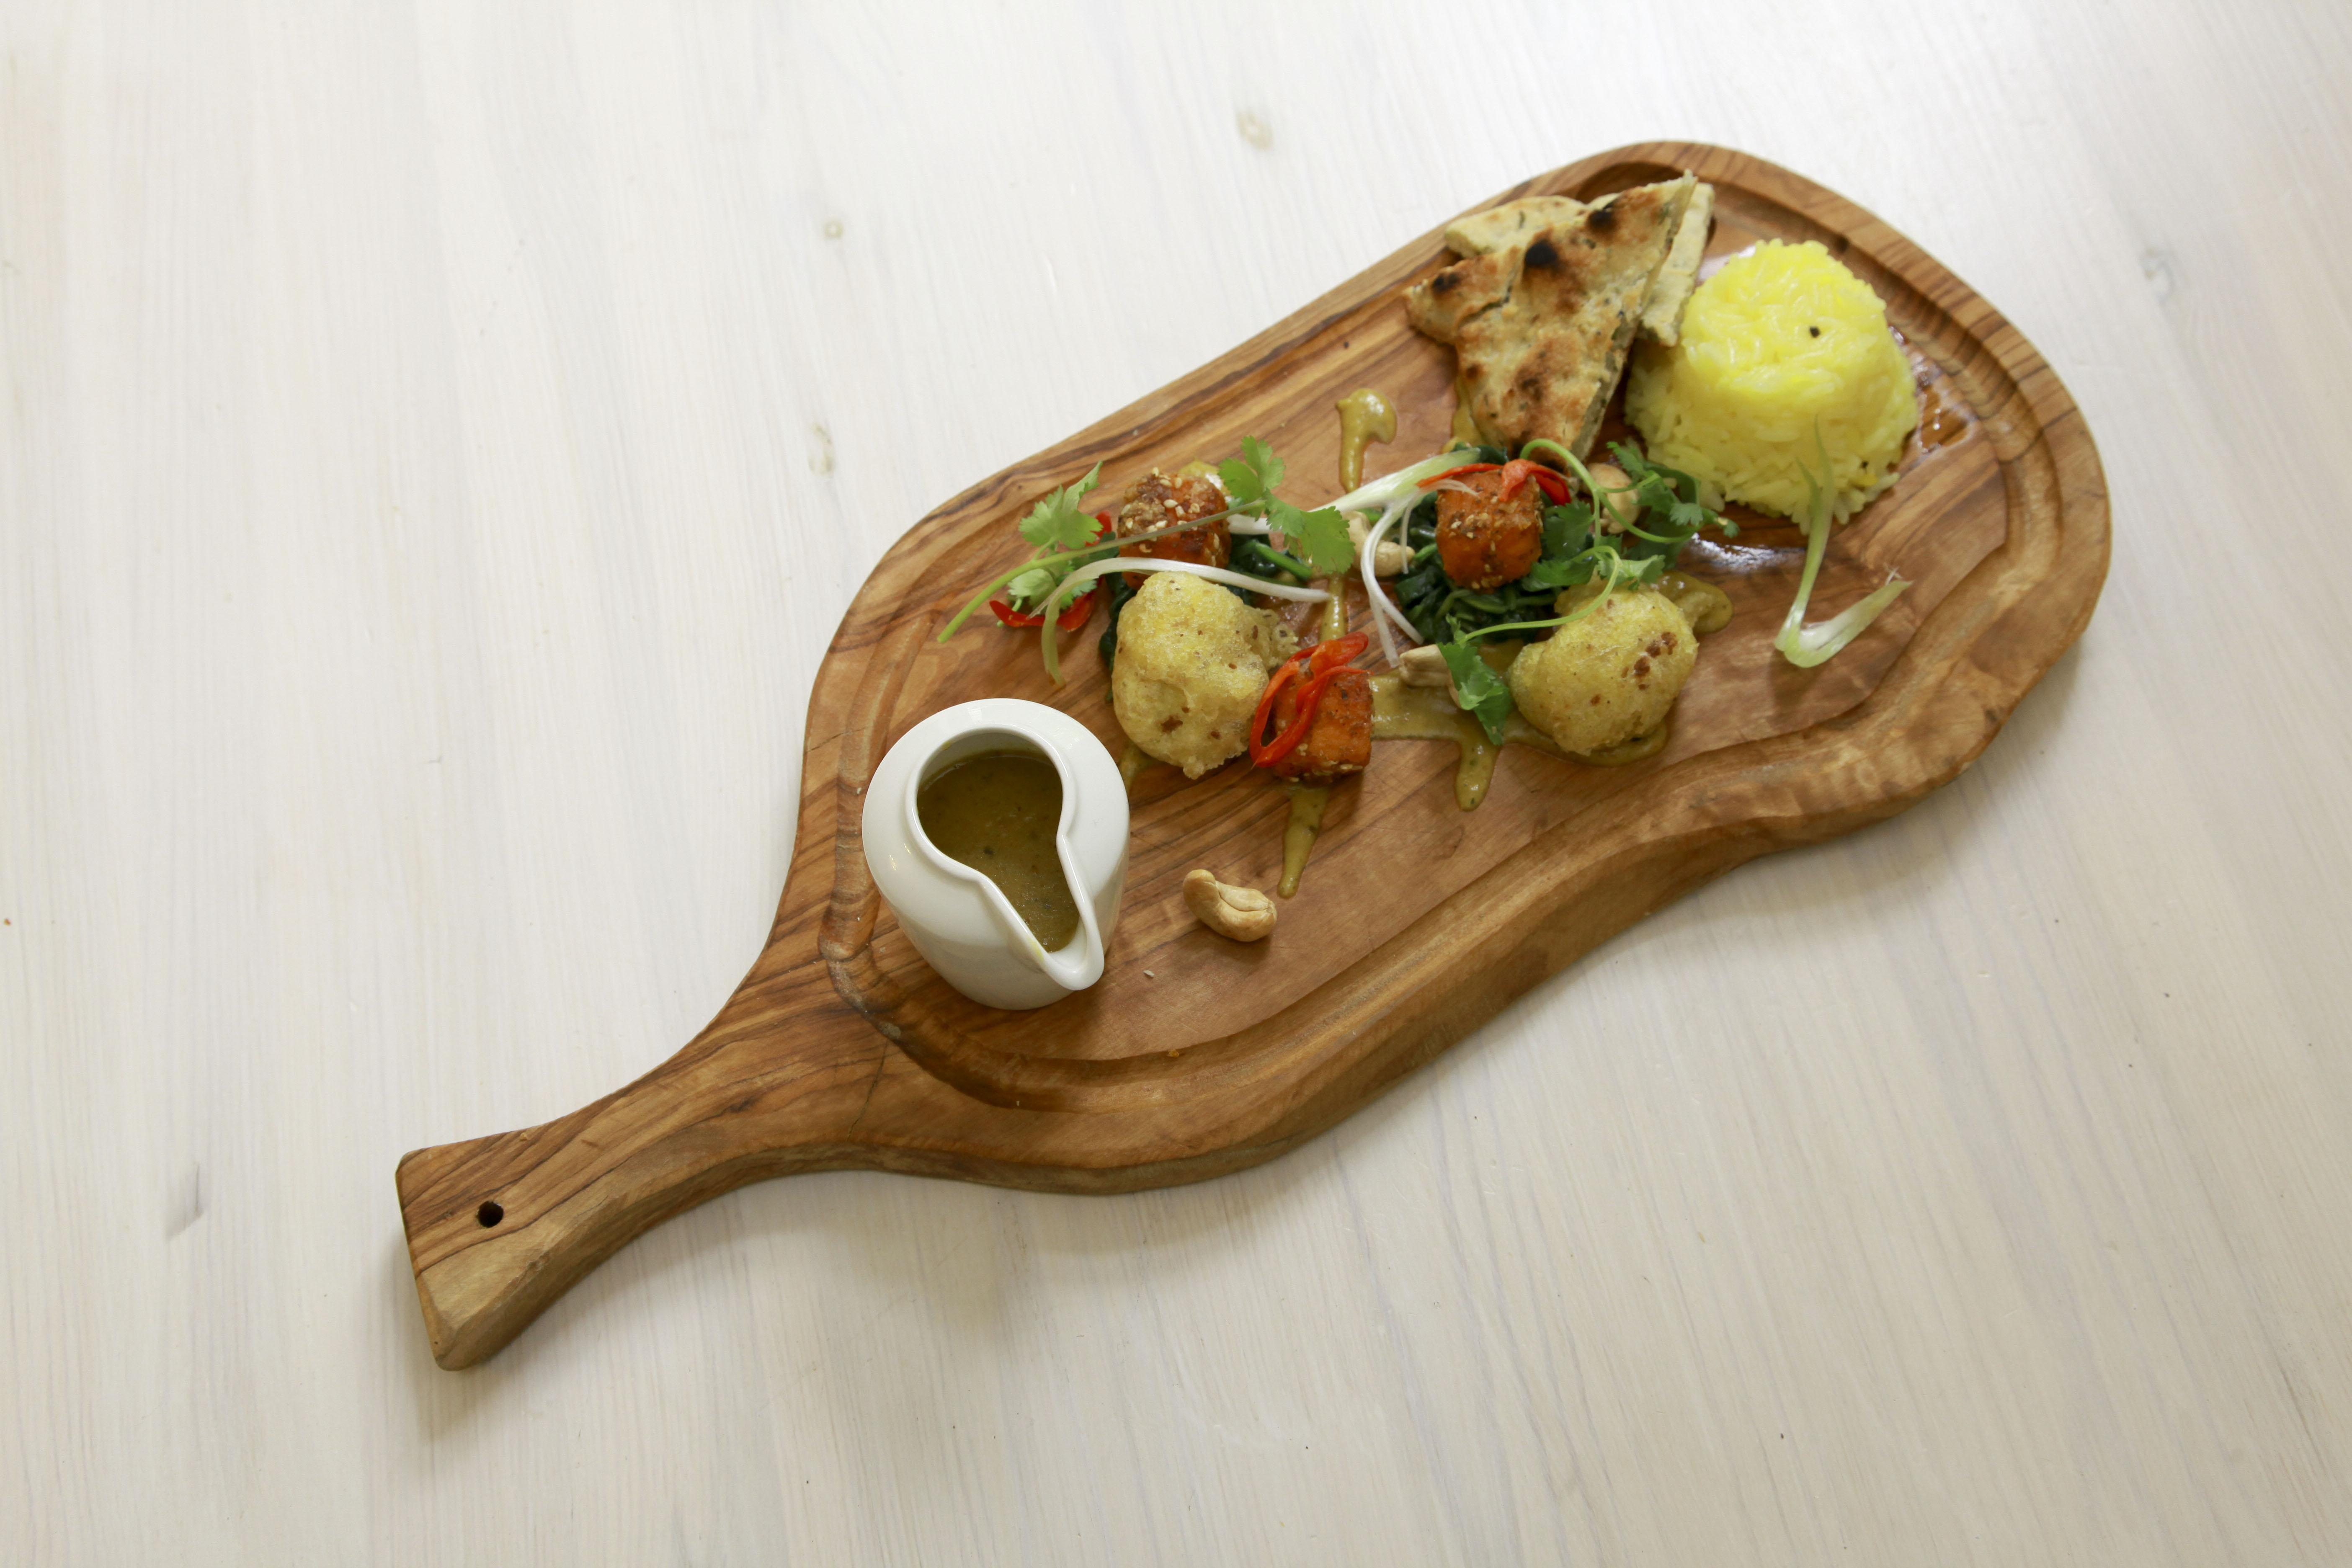 Spinach And Garlic Panna Cotta Recipes — Dishmaps